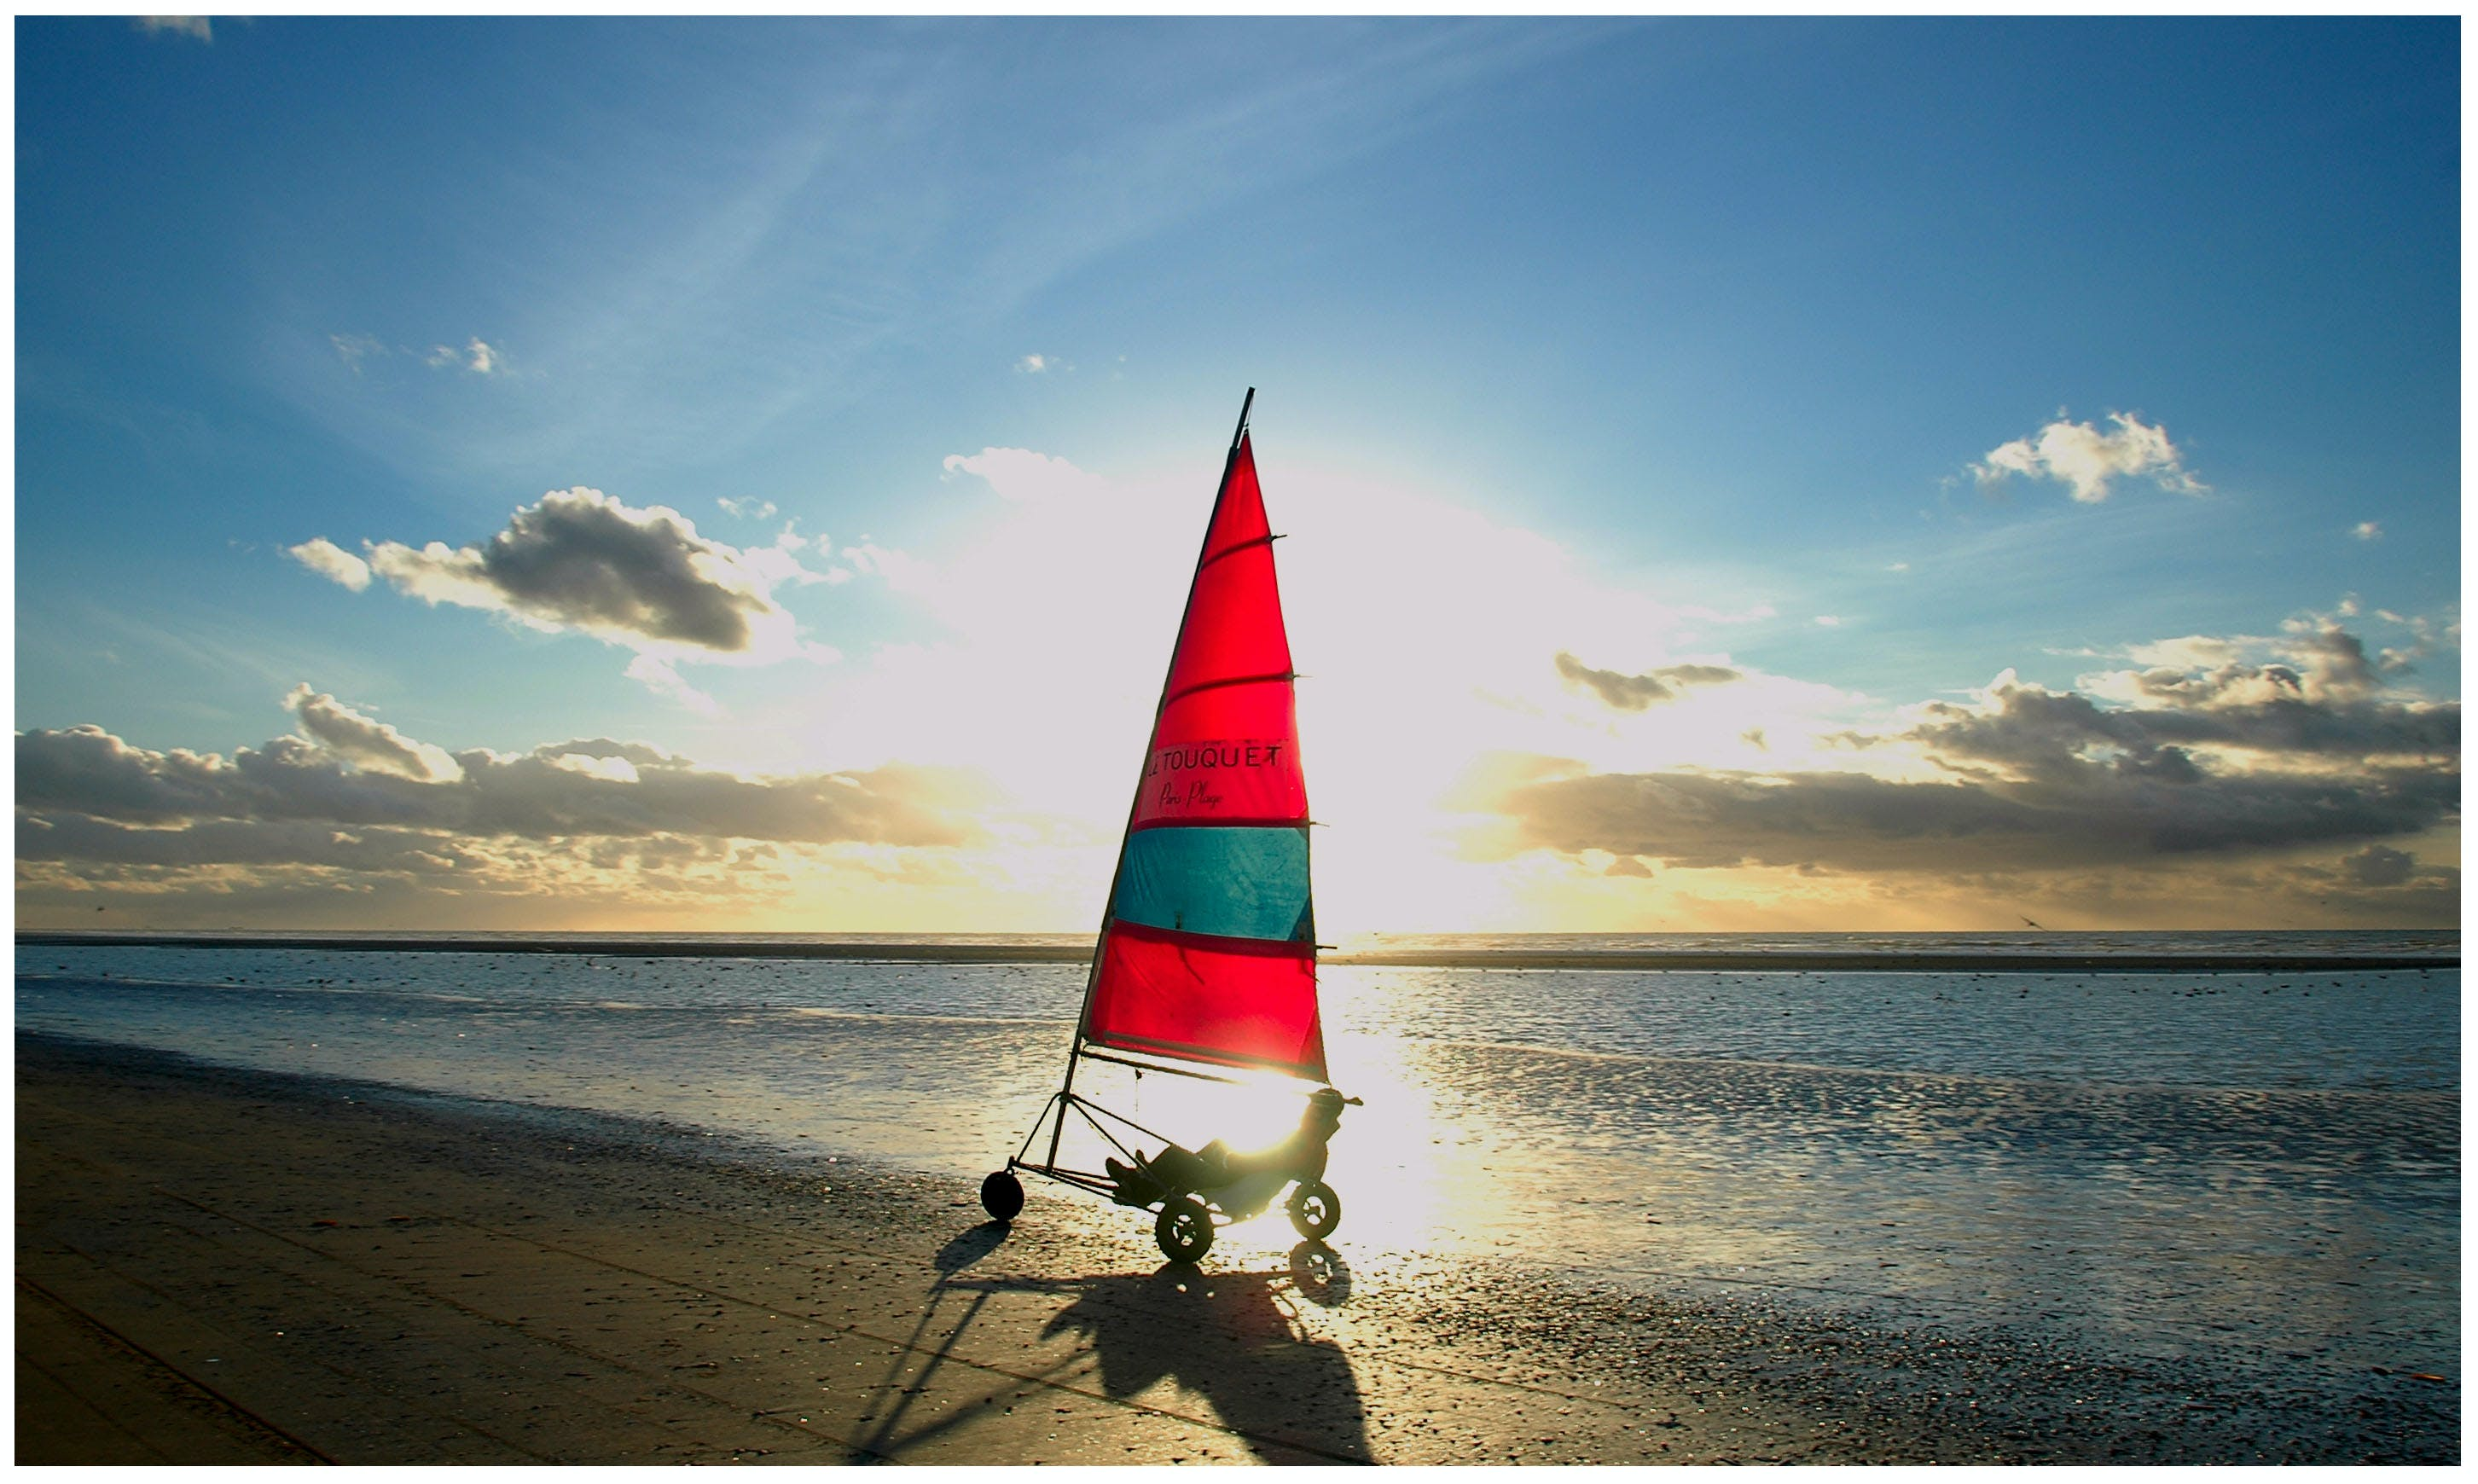 Man Riding Sailboat on Beach Sand